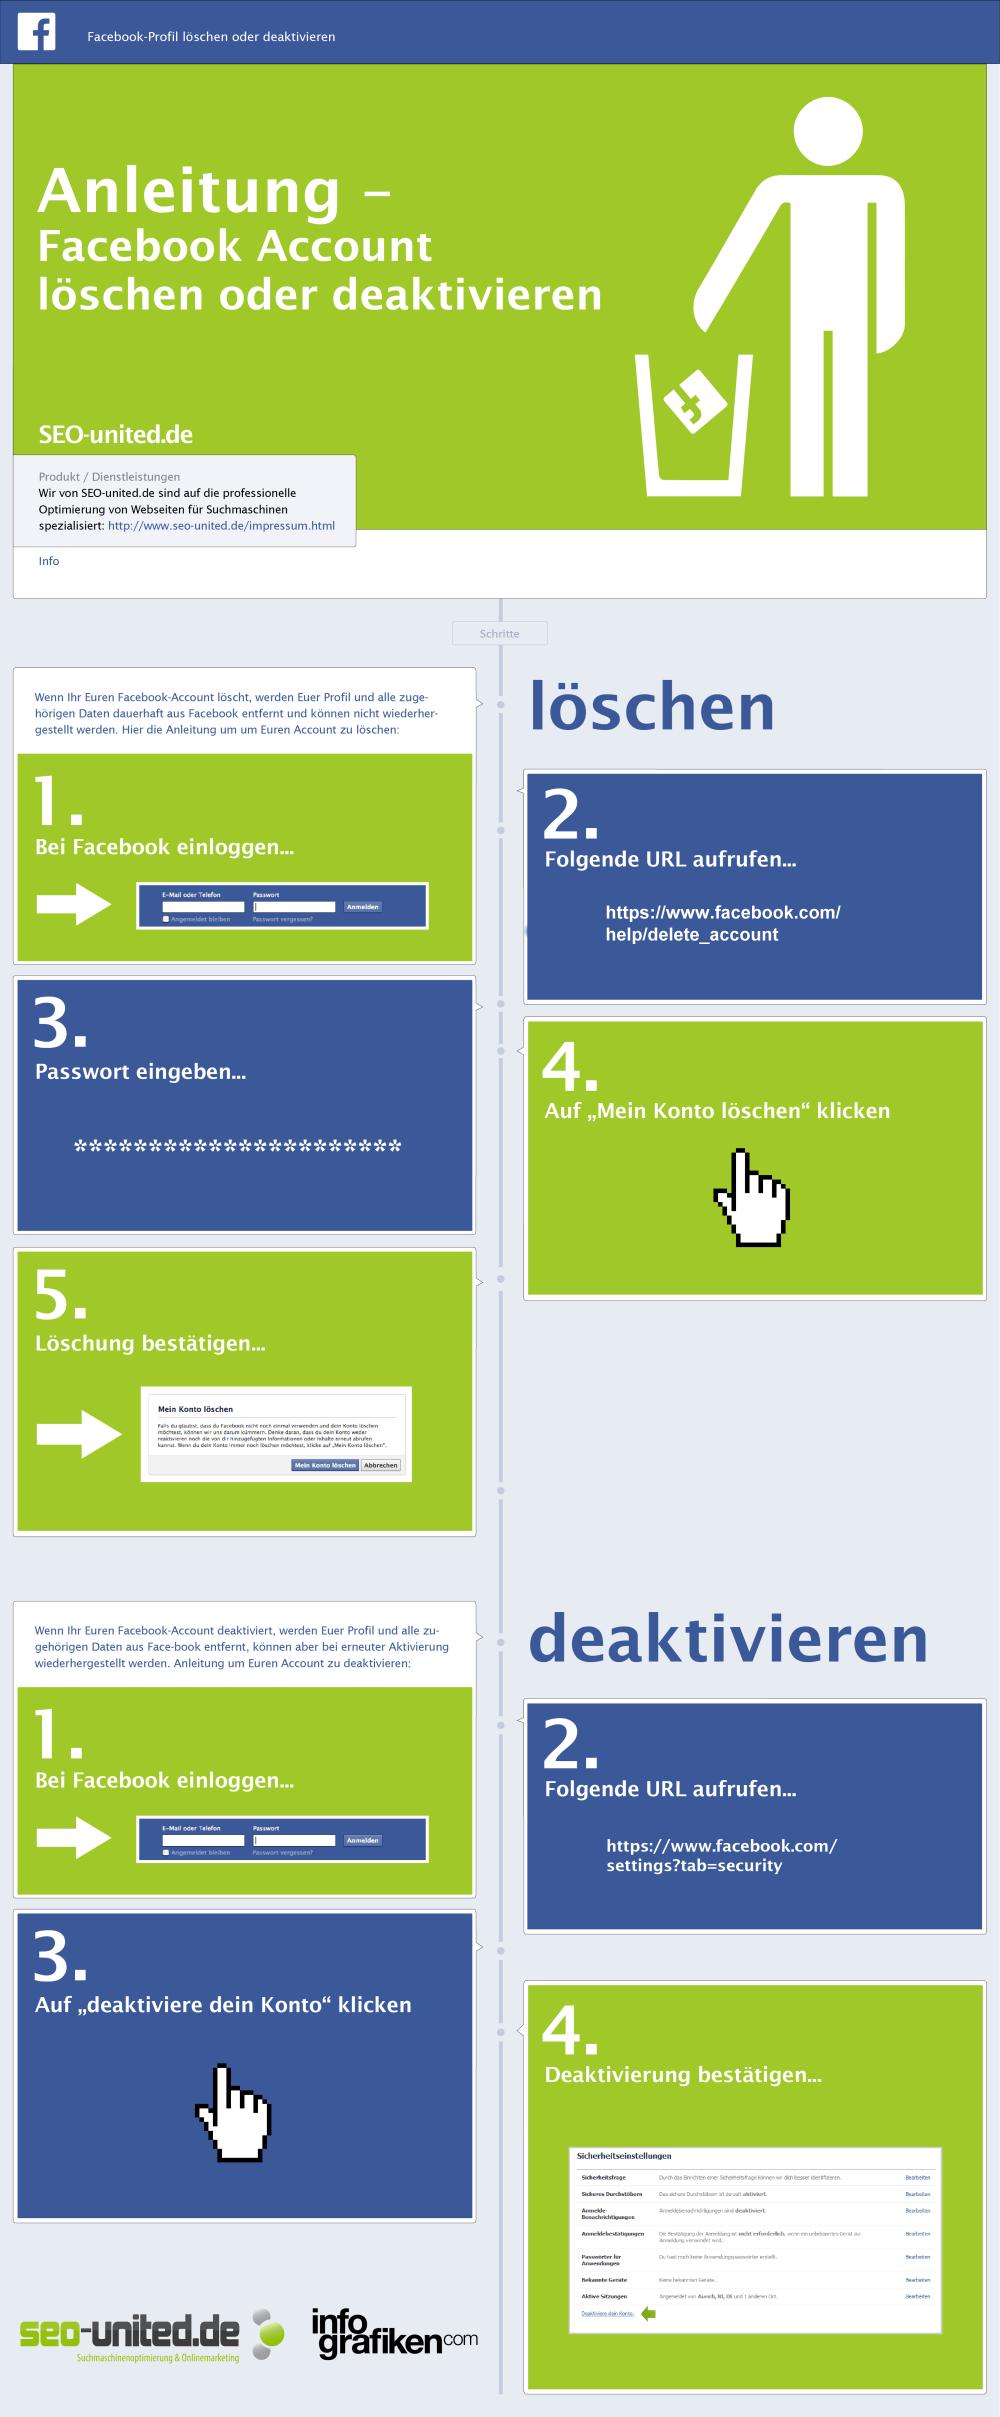 Partnersuche.de account löschen